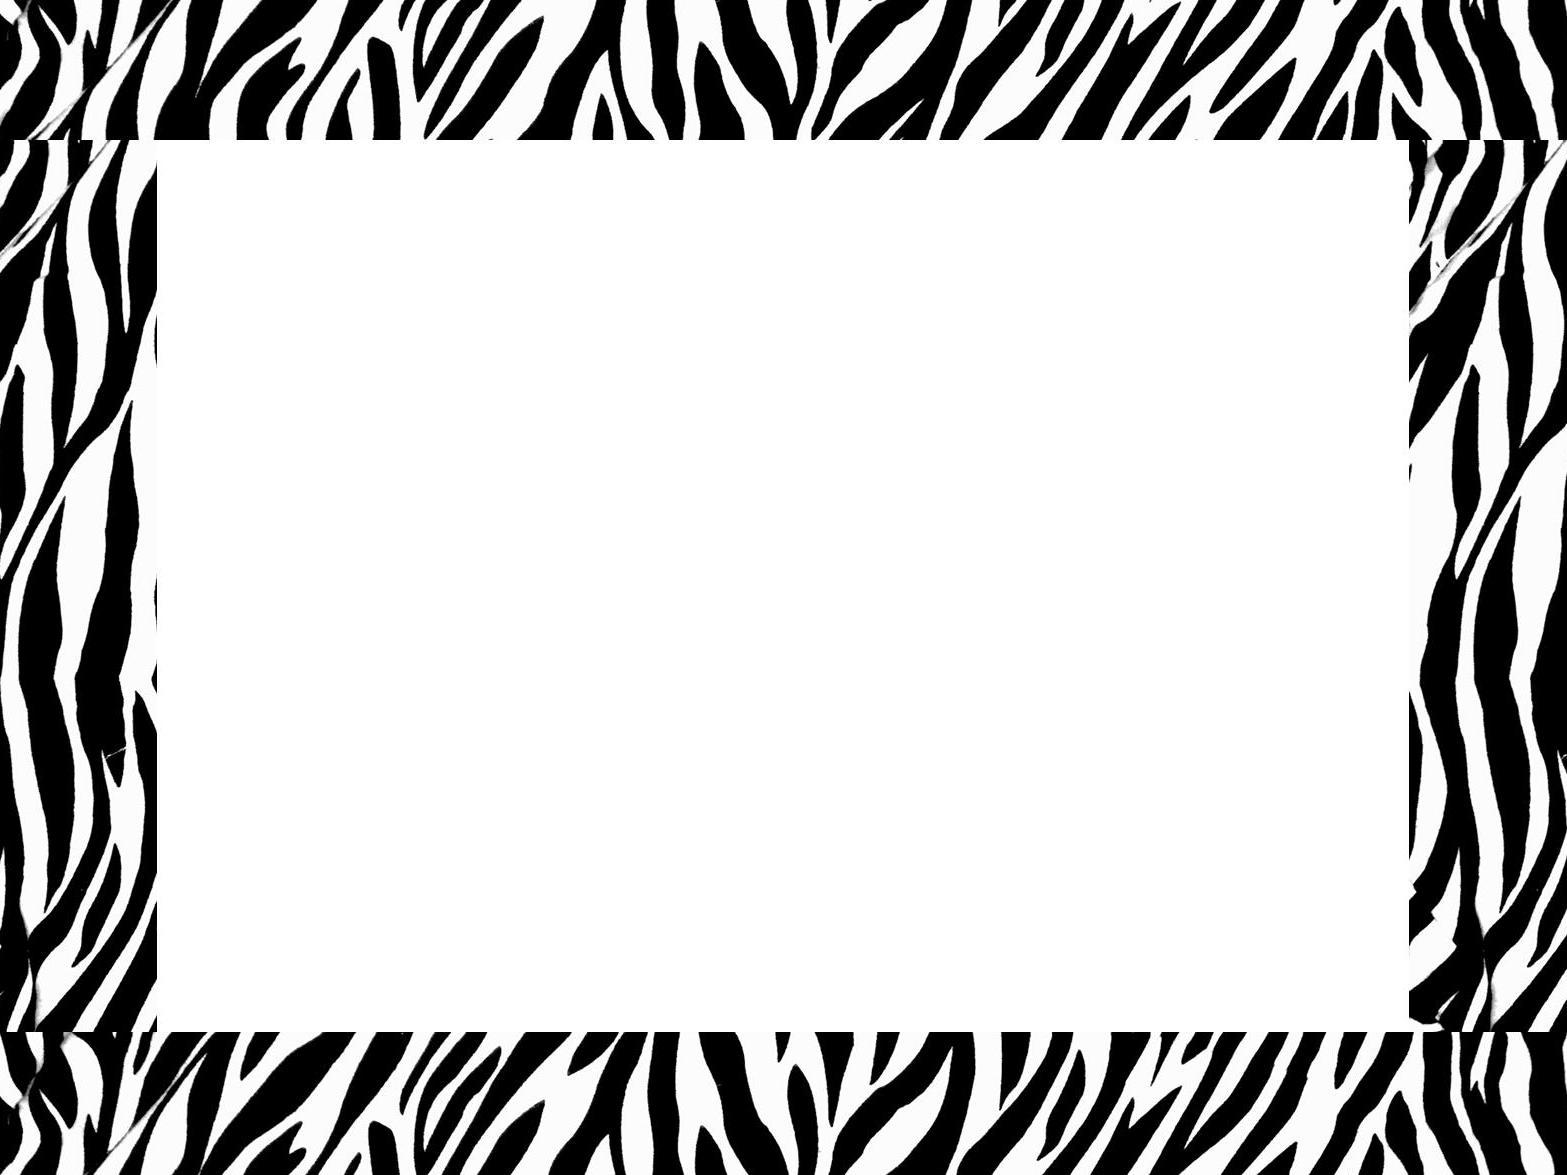 Free Zebra Print Border Template Download Free Clip Art